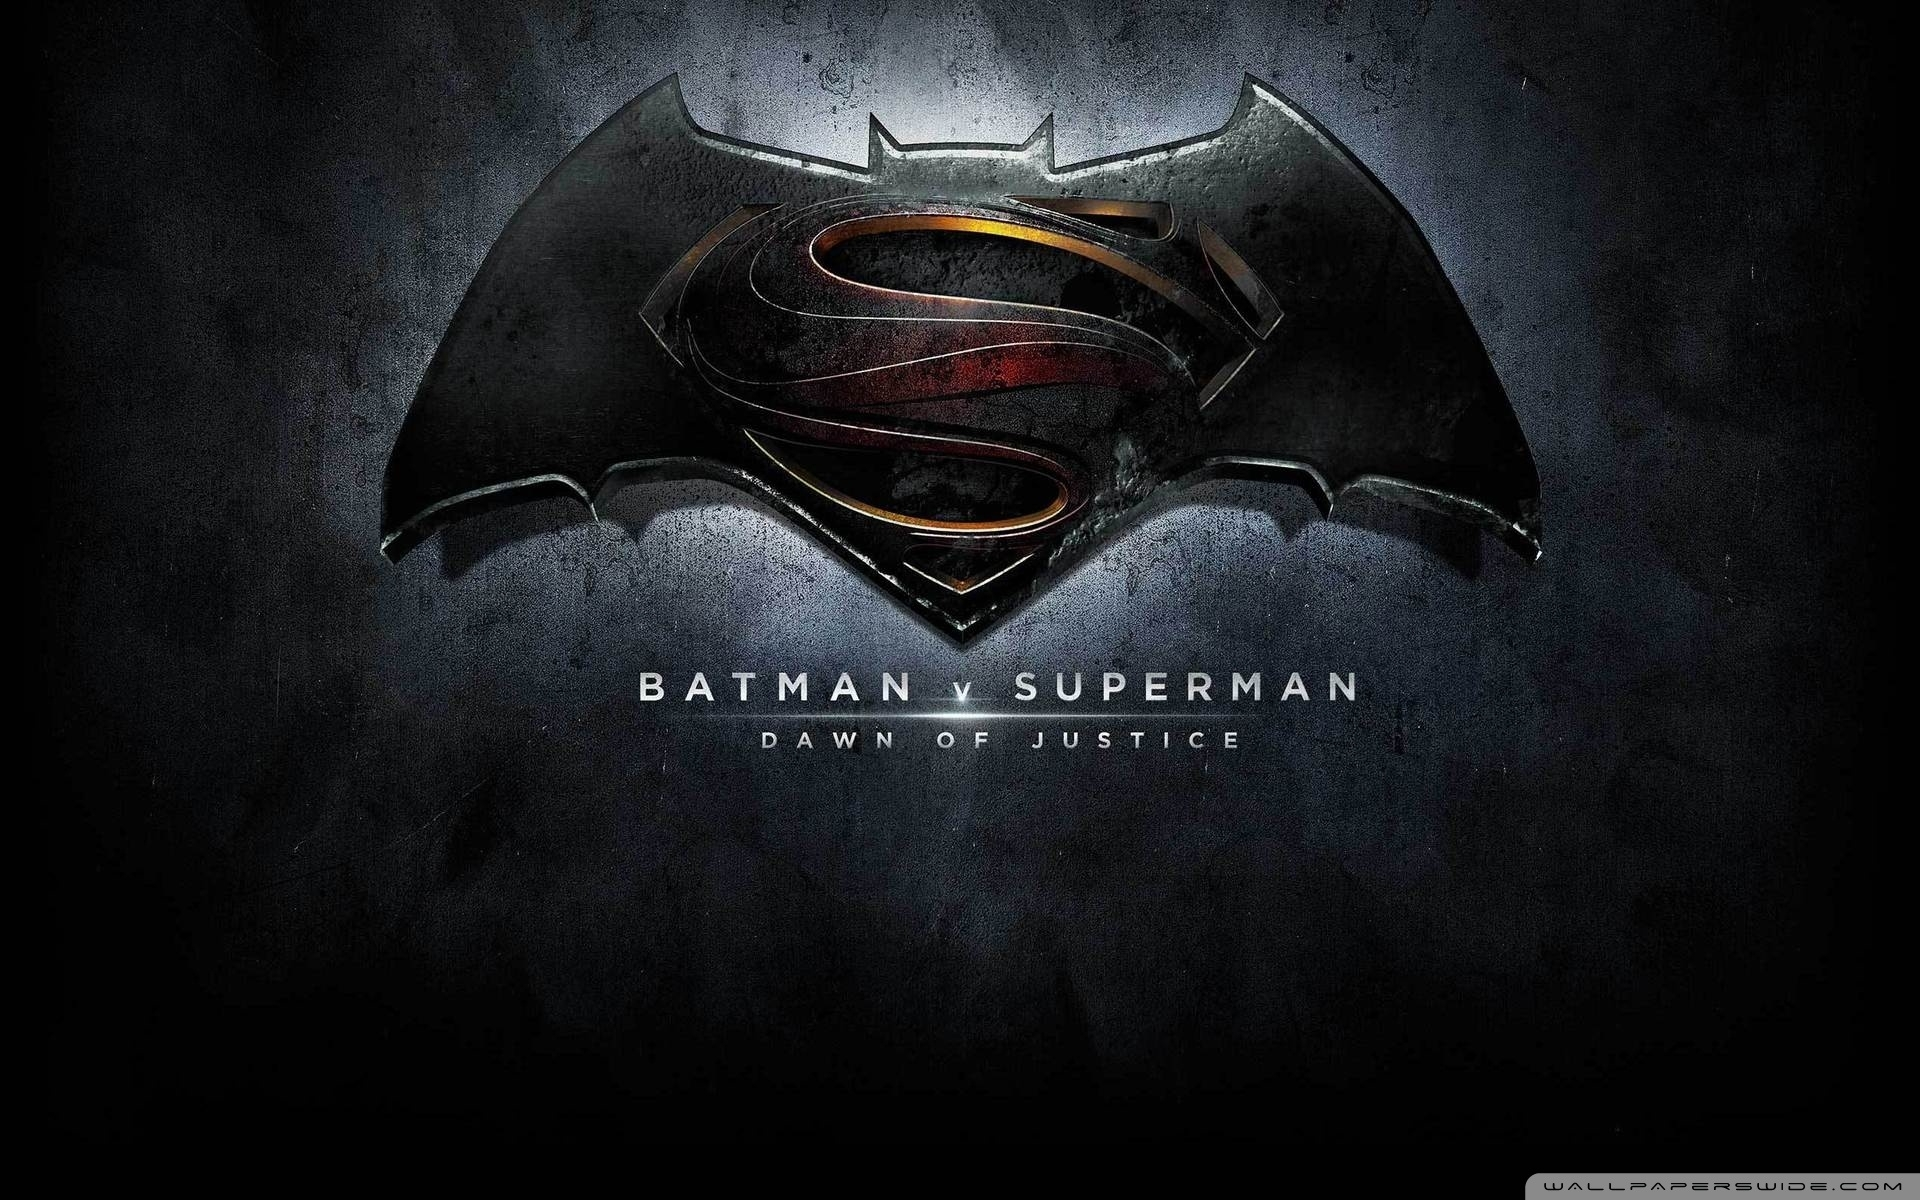 10 New Batman V Superman Logo Wallpaper FULL HD 1920x1080 For PC Desktop 2018